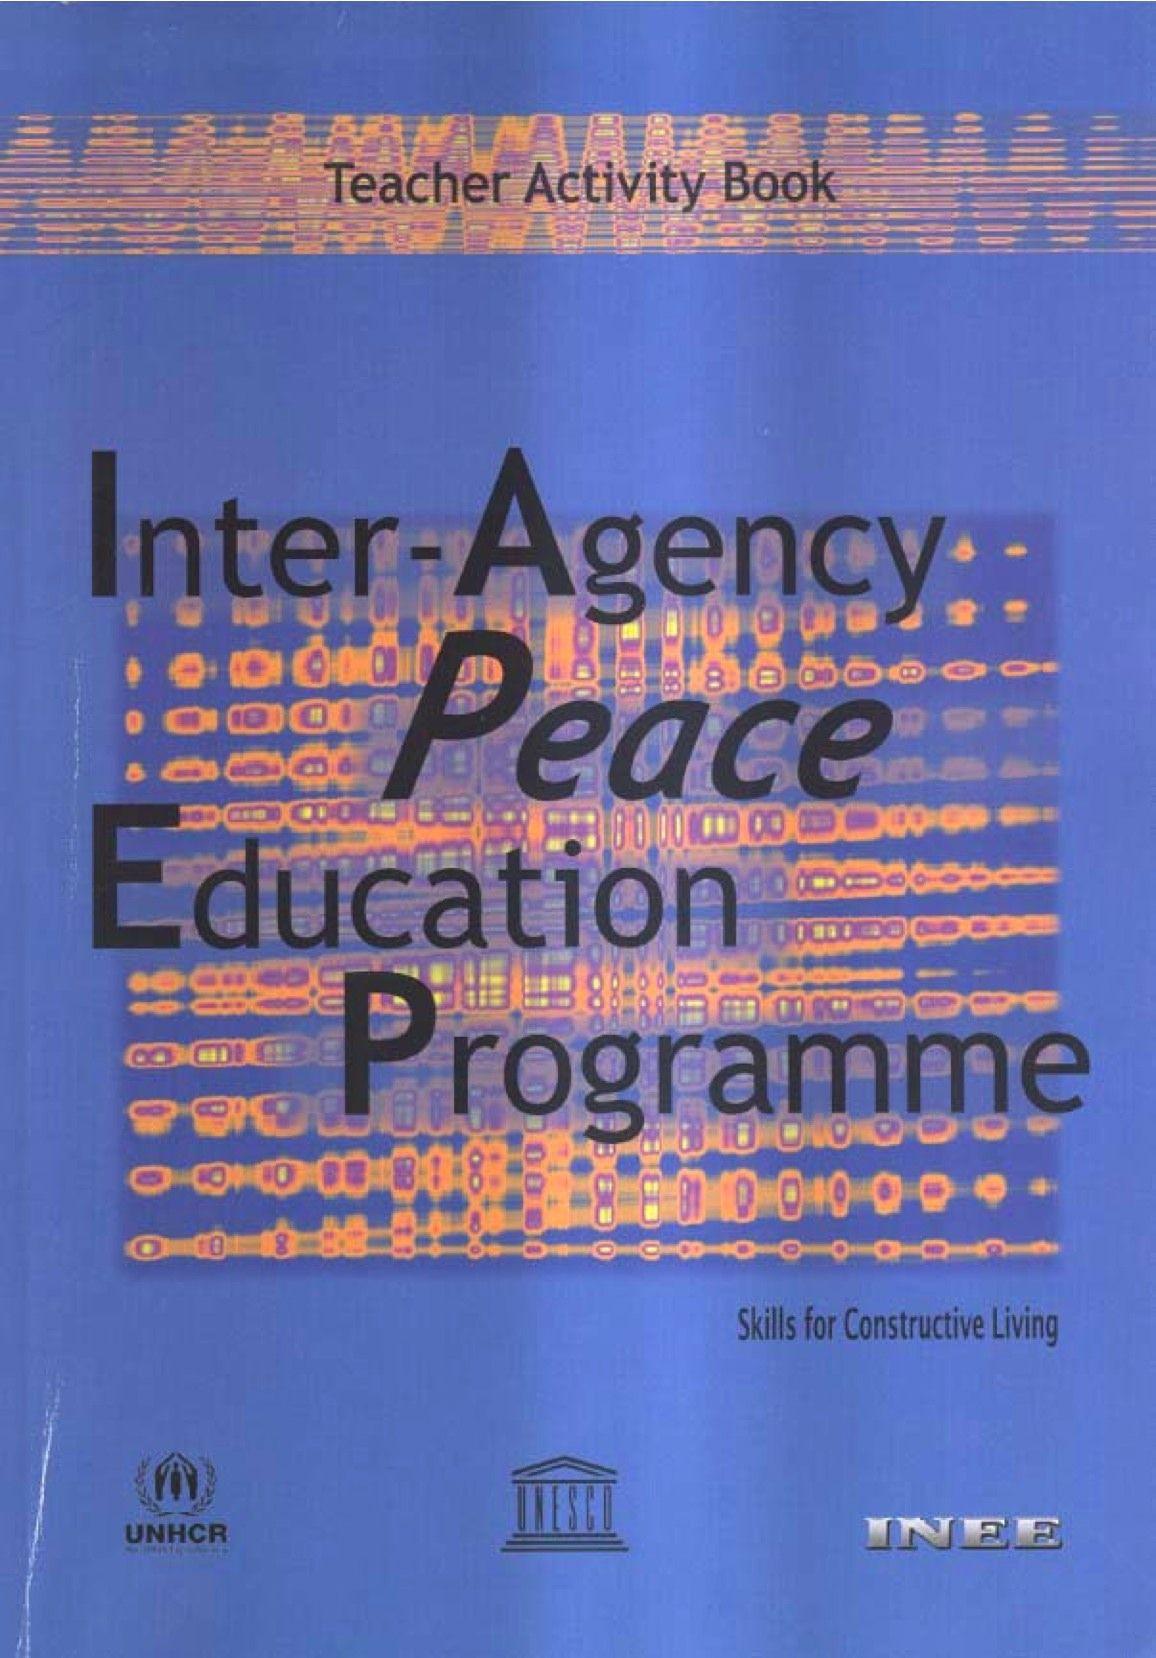 Inter Agency P.E.P.: Skills For Constructive Living: Teacher Activity Book